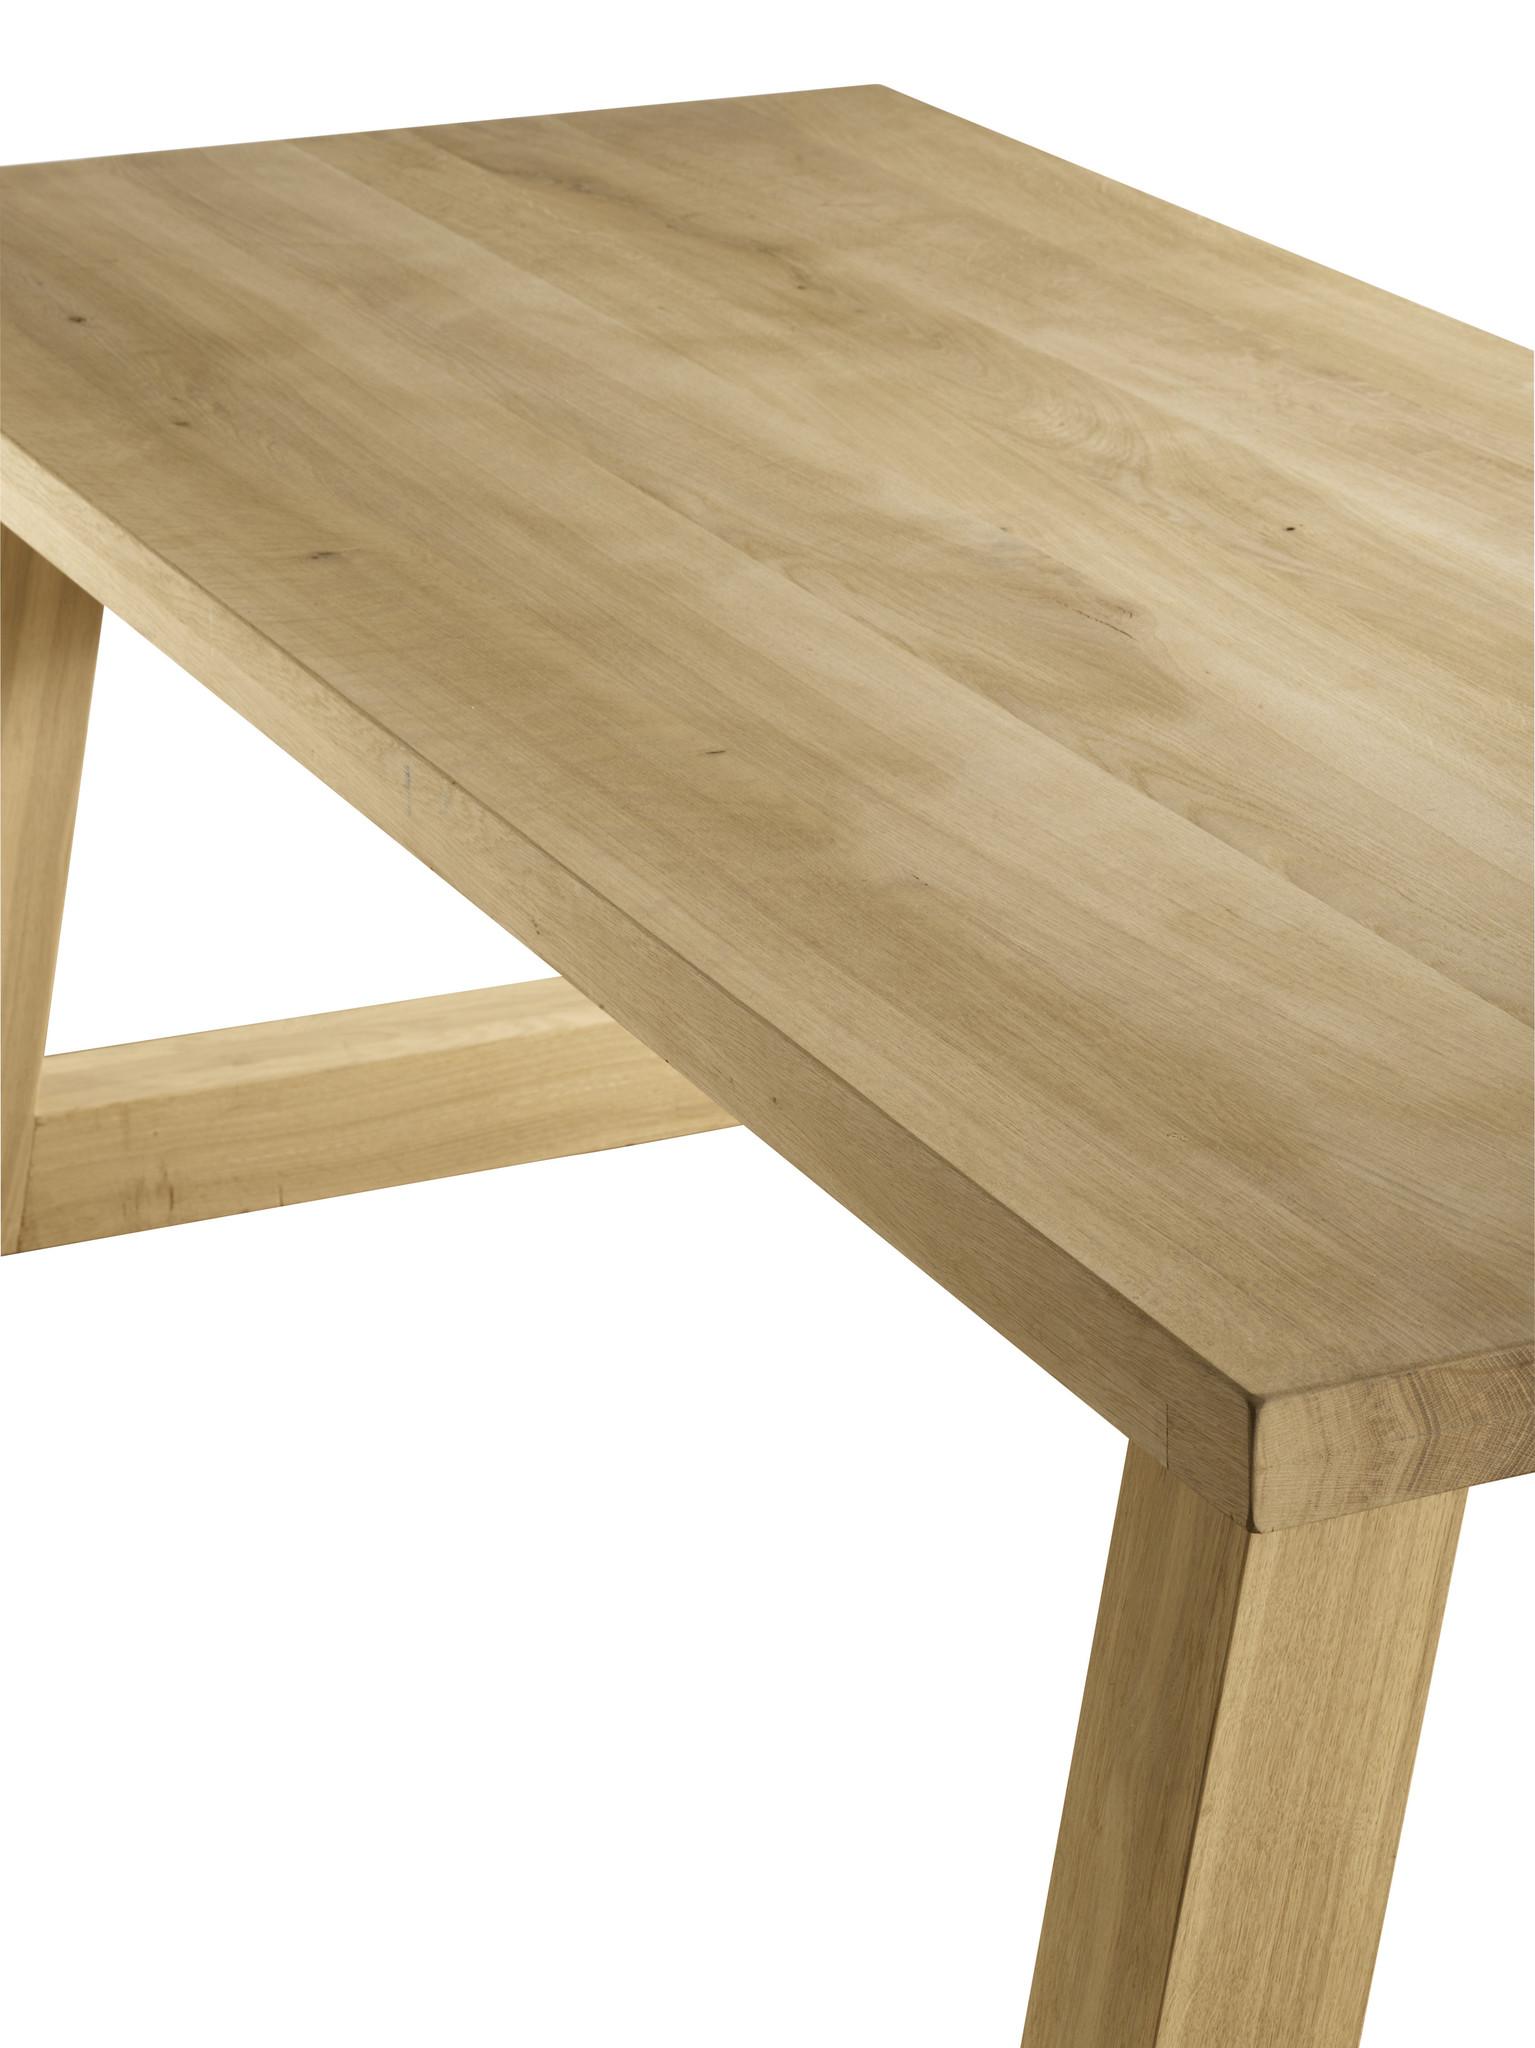 Eiken houten tafel - Trapezium